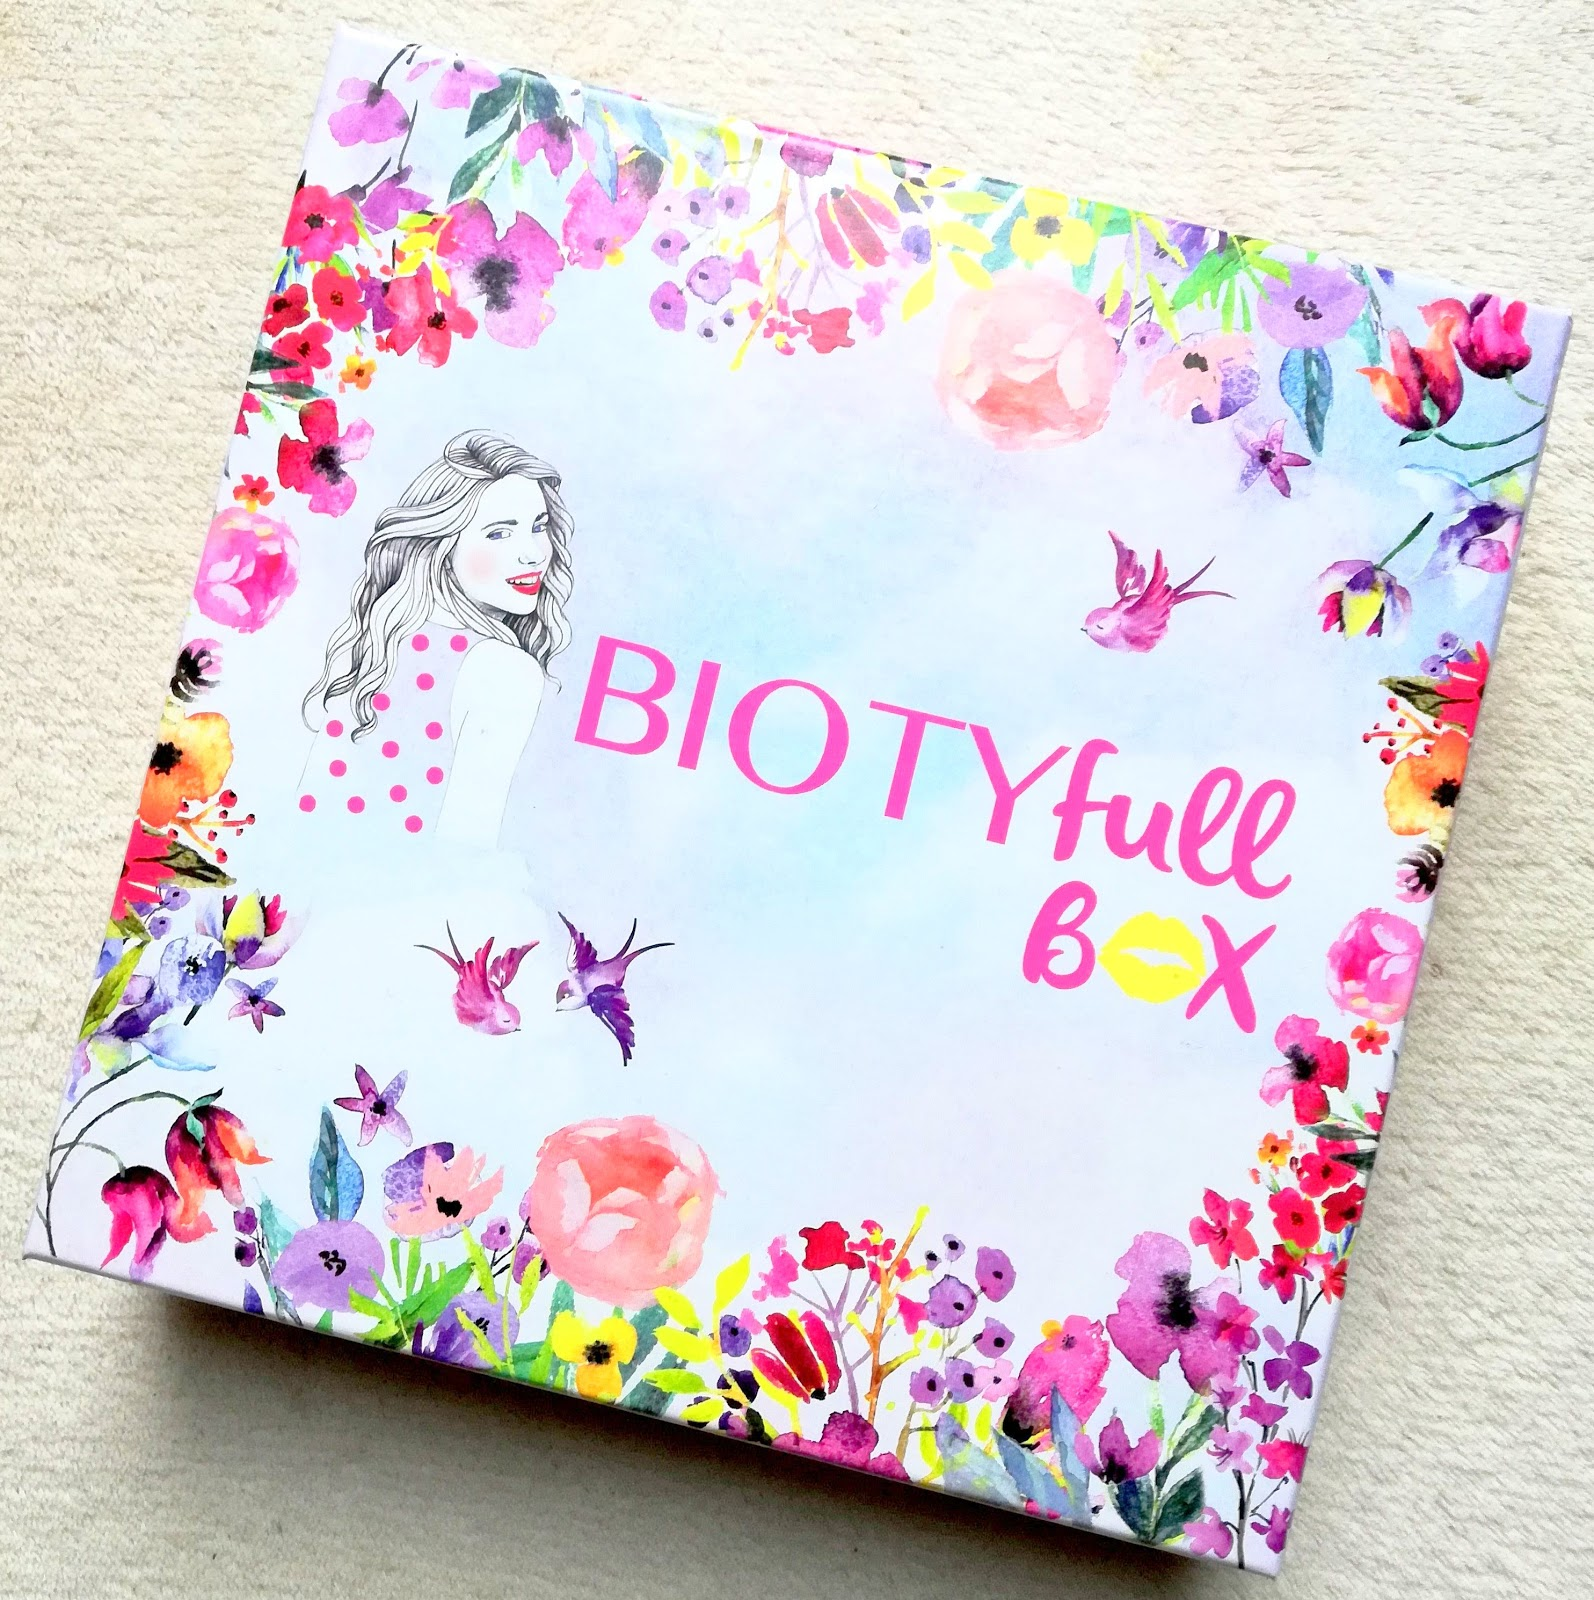 BIOTYFULL BOX Mars 2019 : L'Indispensable